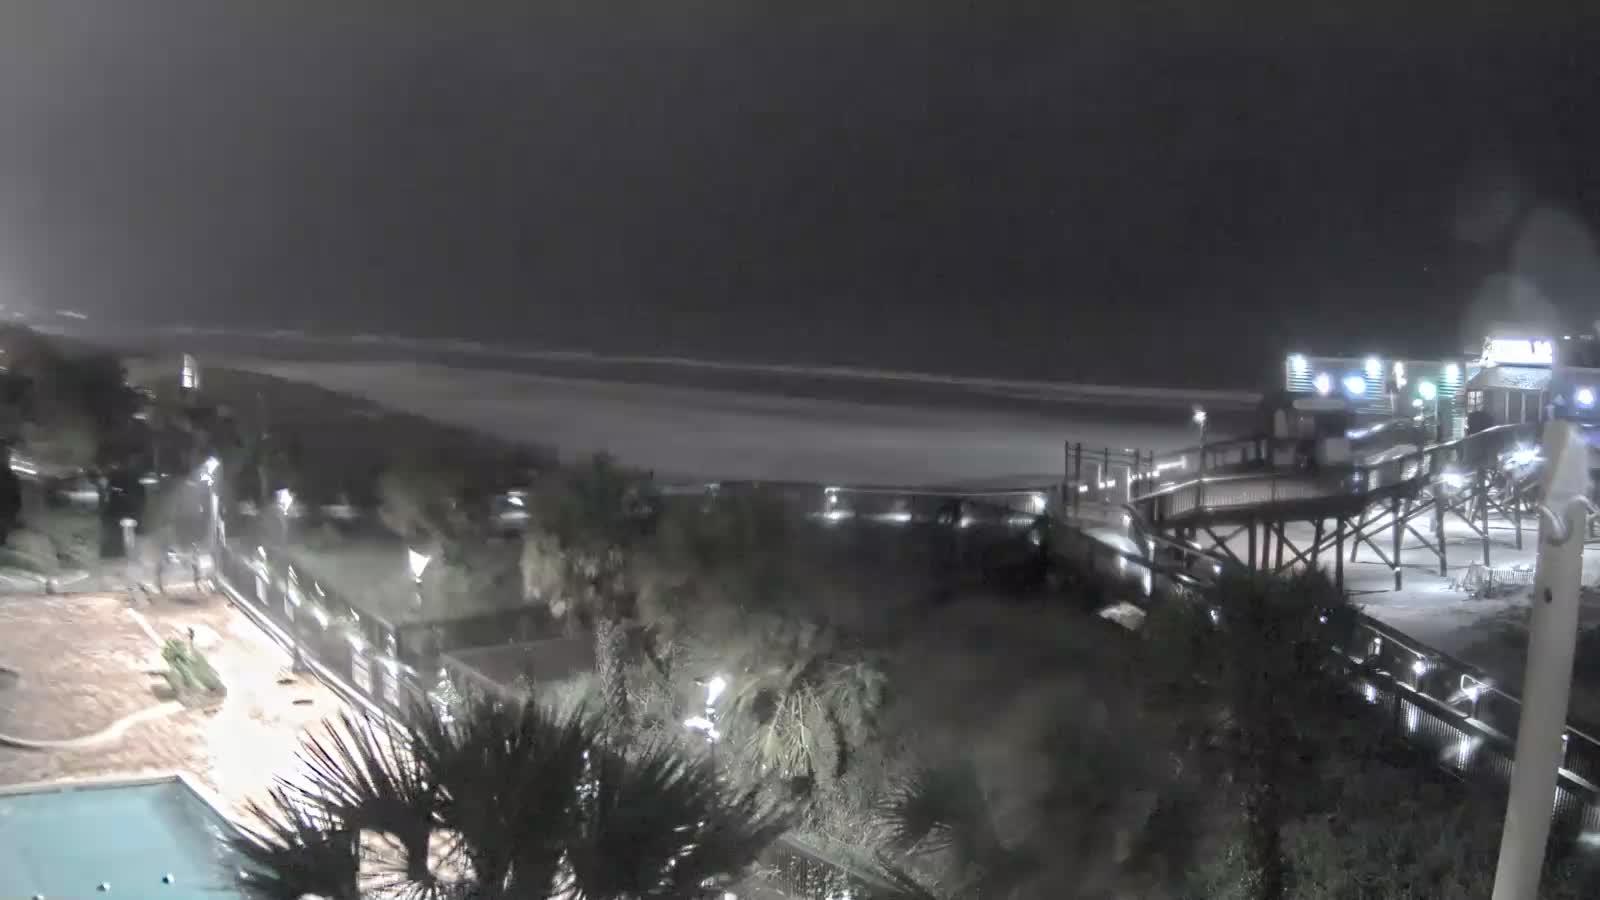 Riptydz Myrtle Beach Webcam Recording for Dorian Approach (2019)